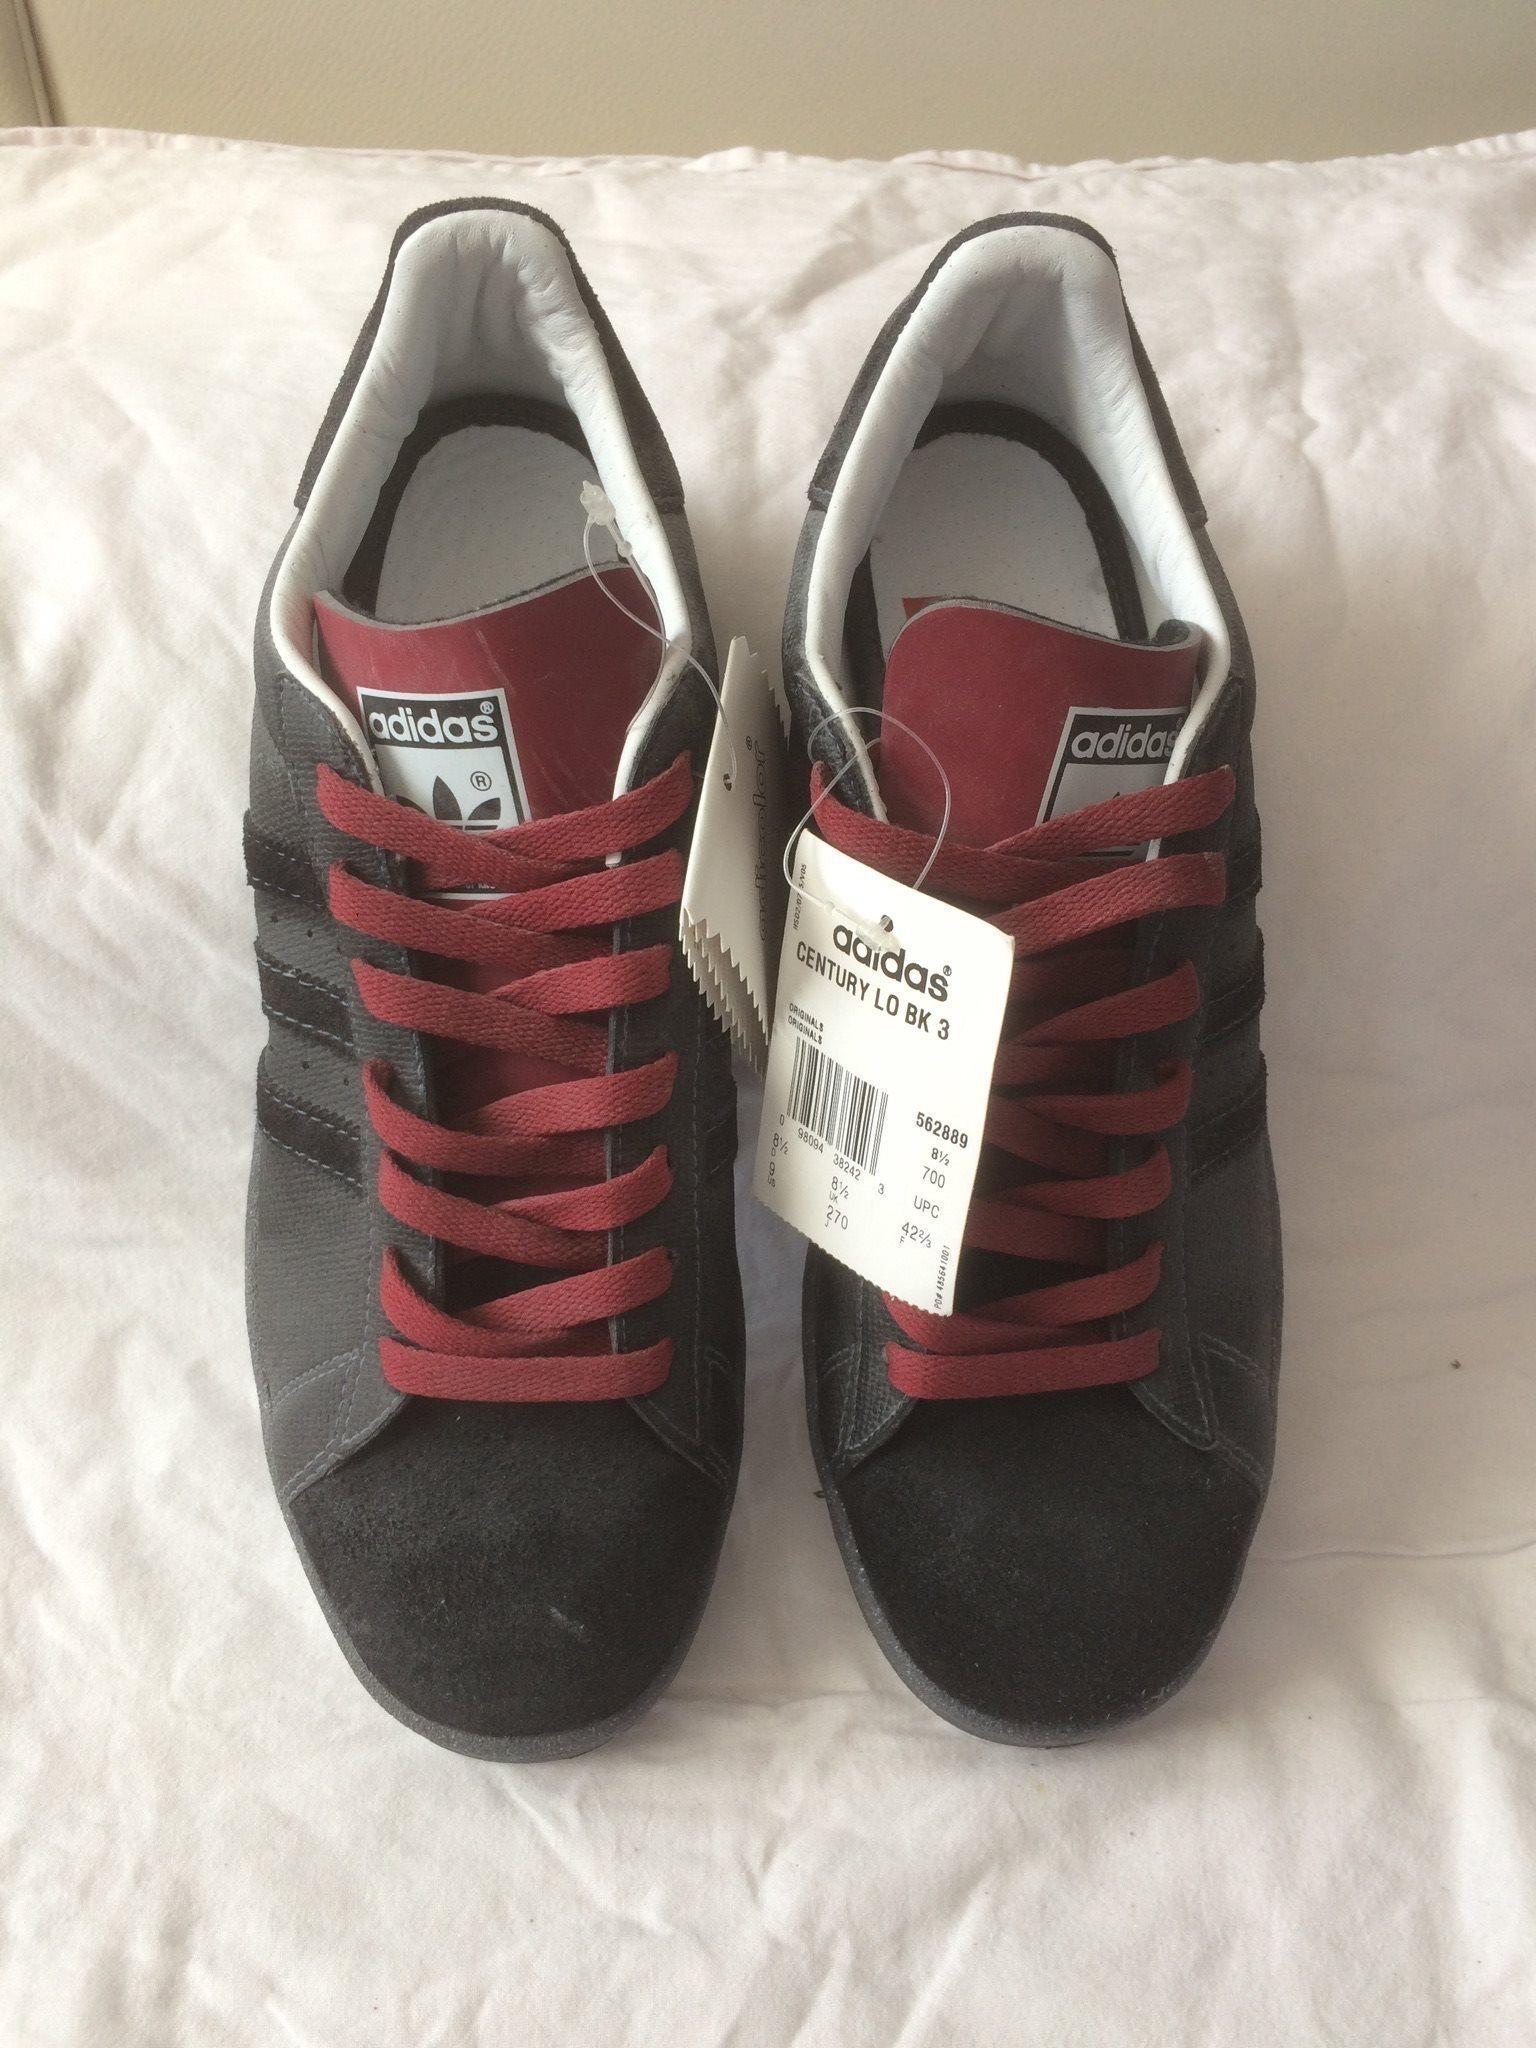 Adidas Adicolor, Century LO BK 3, Crooked Toung.. (344601212